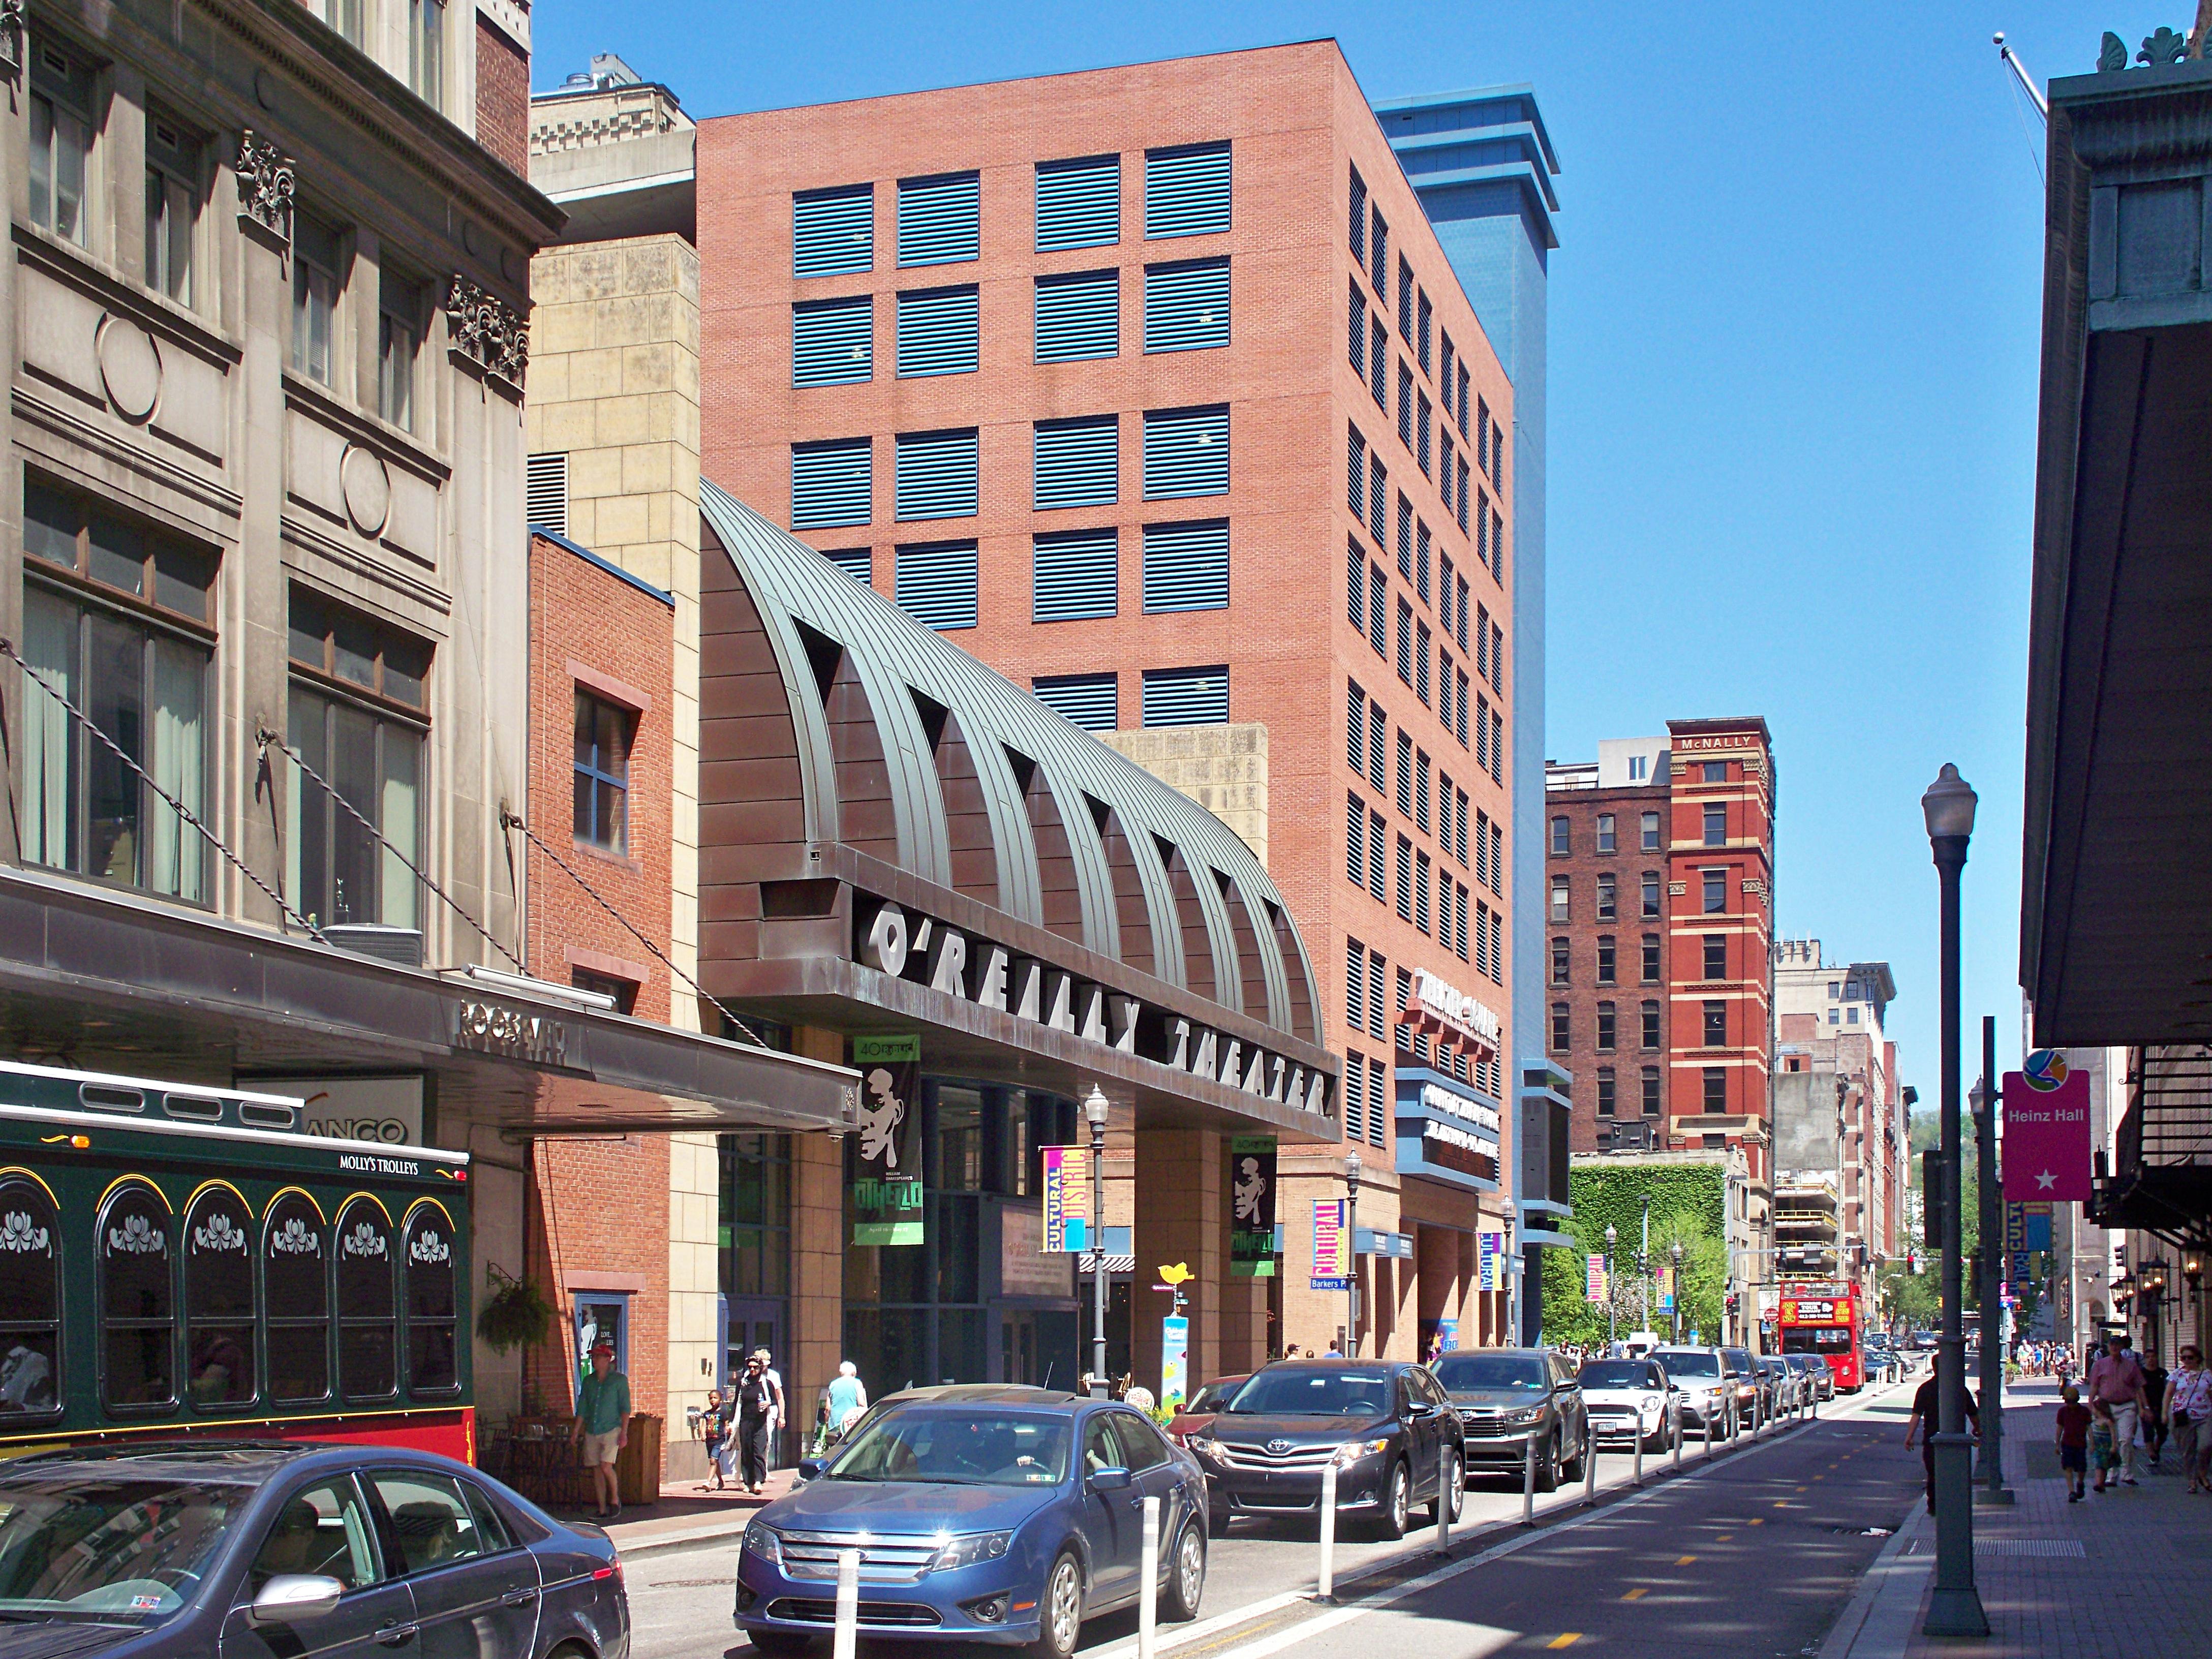 Penn Avenue Cultural District Father Pitt